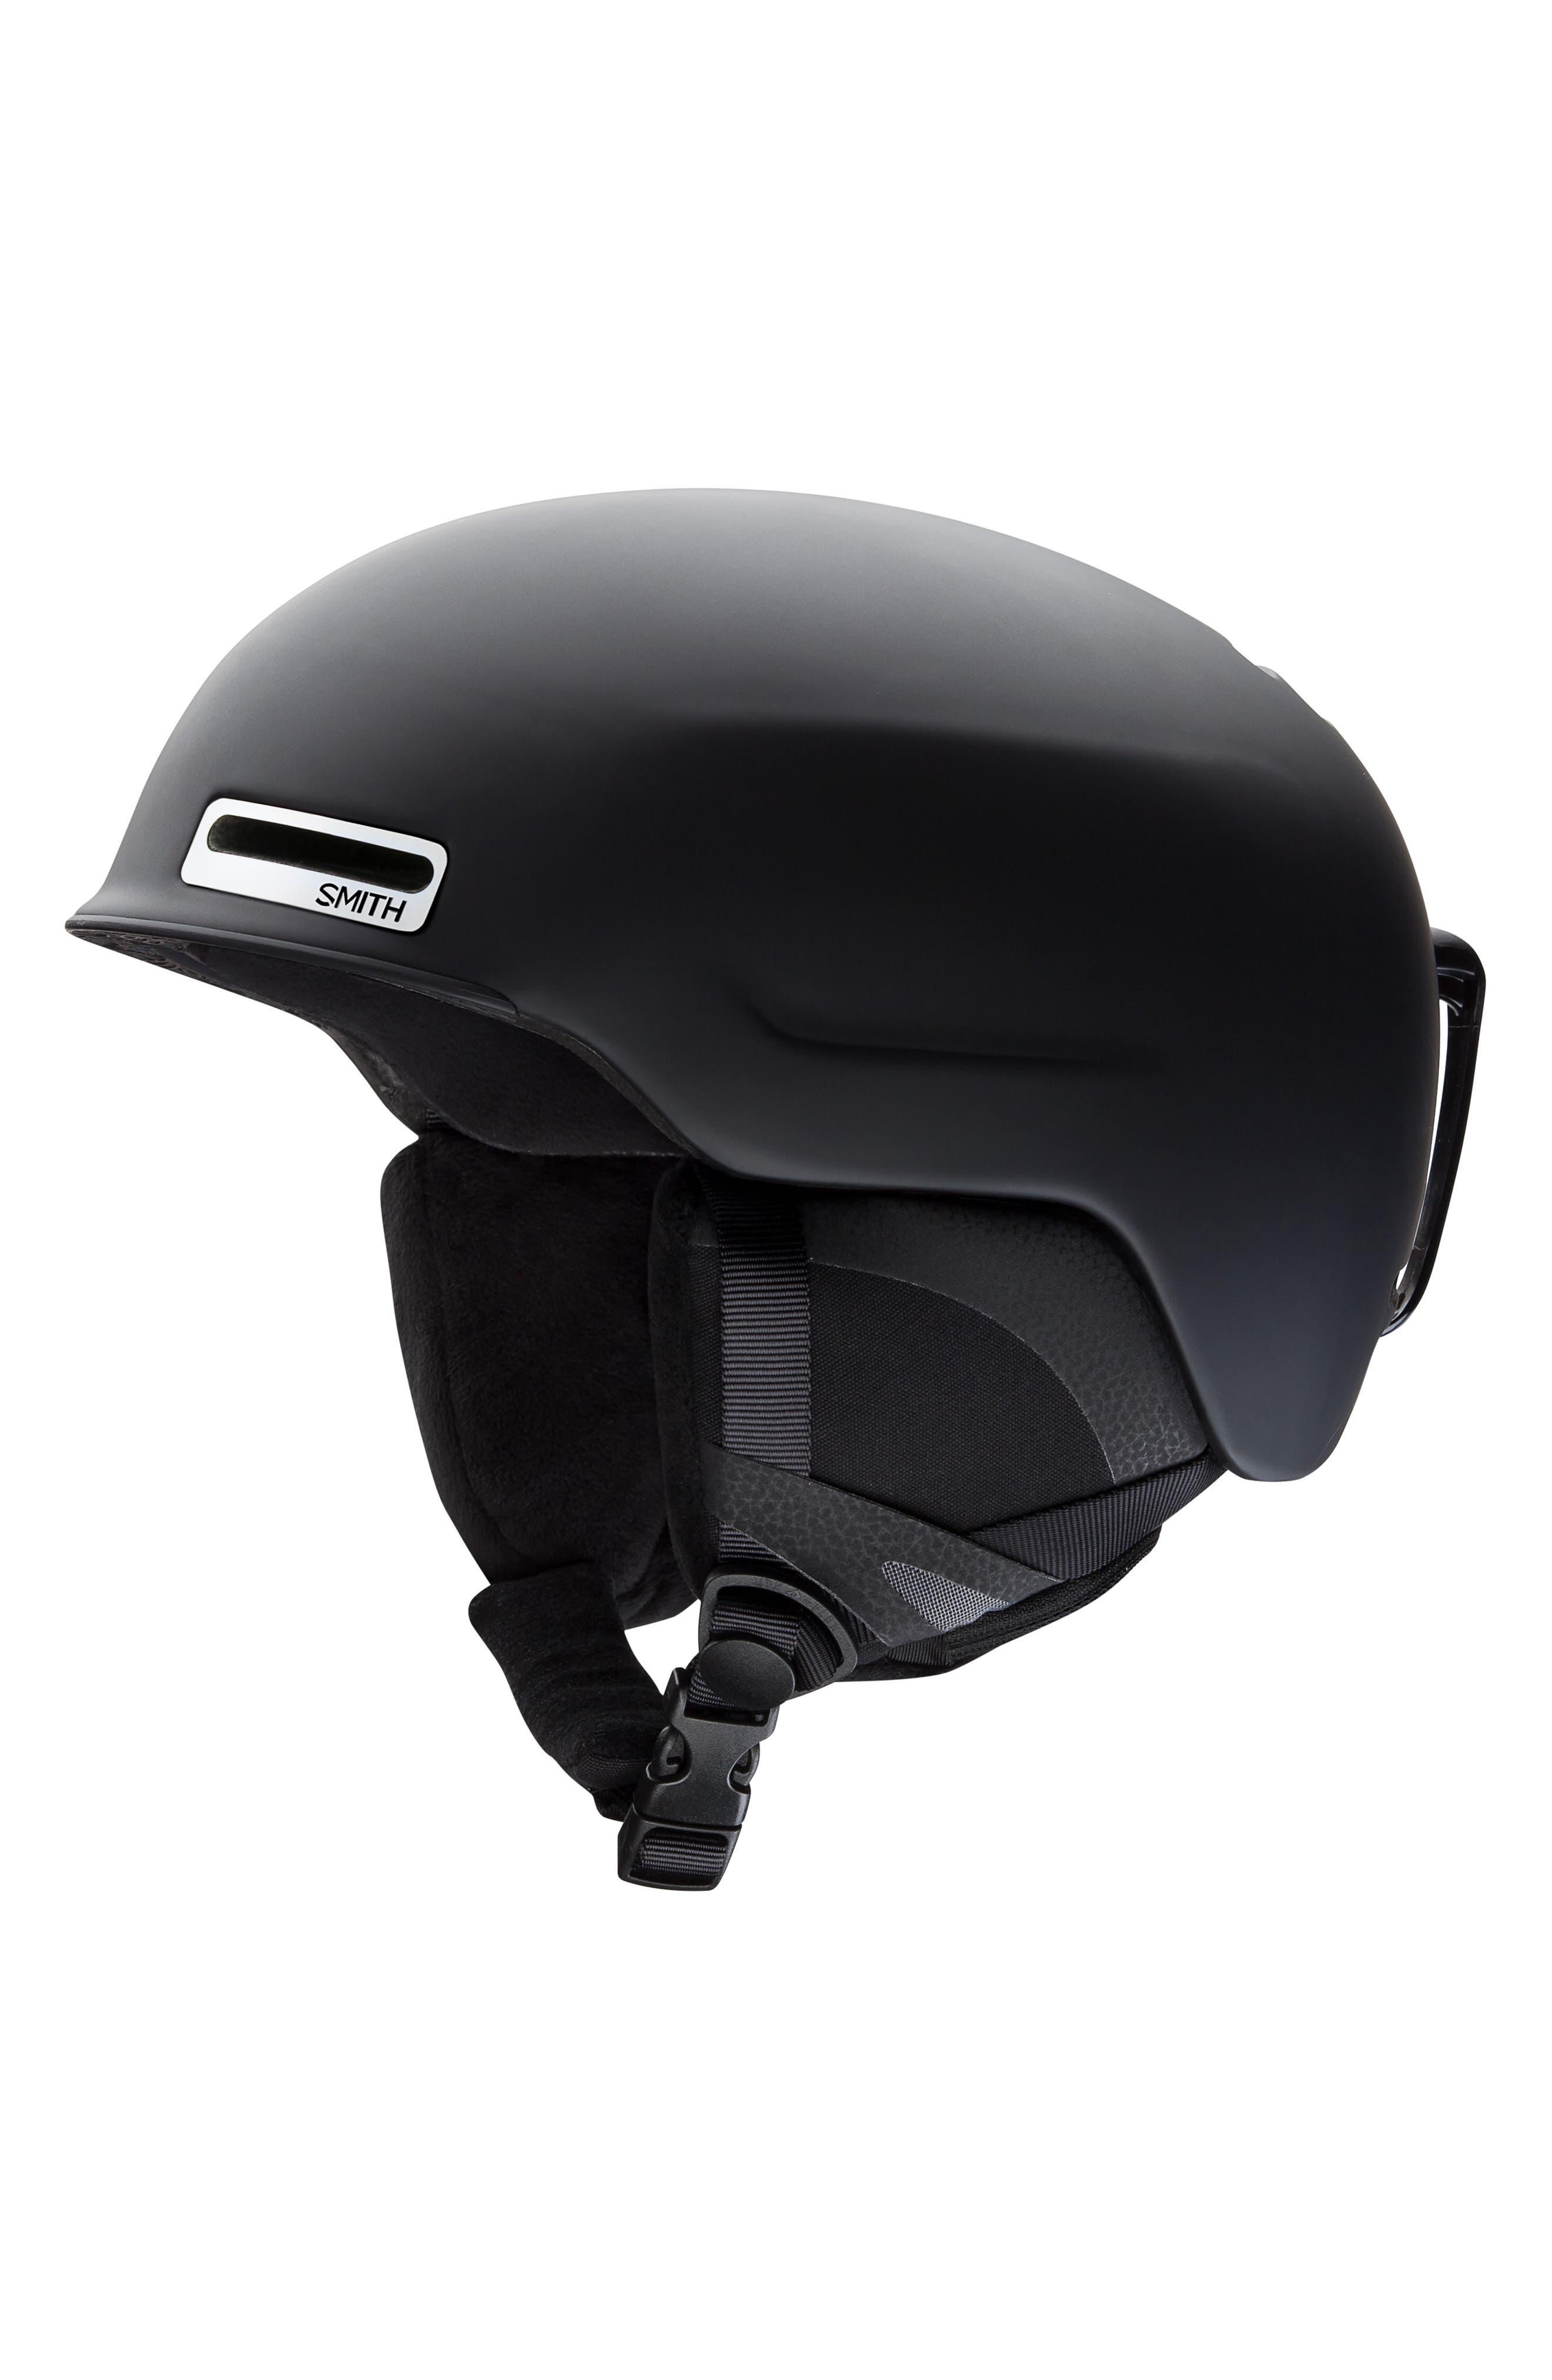 Smith Maze with MIPS Snow Helmet